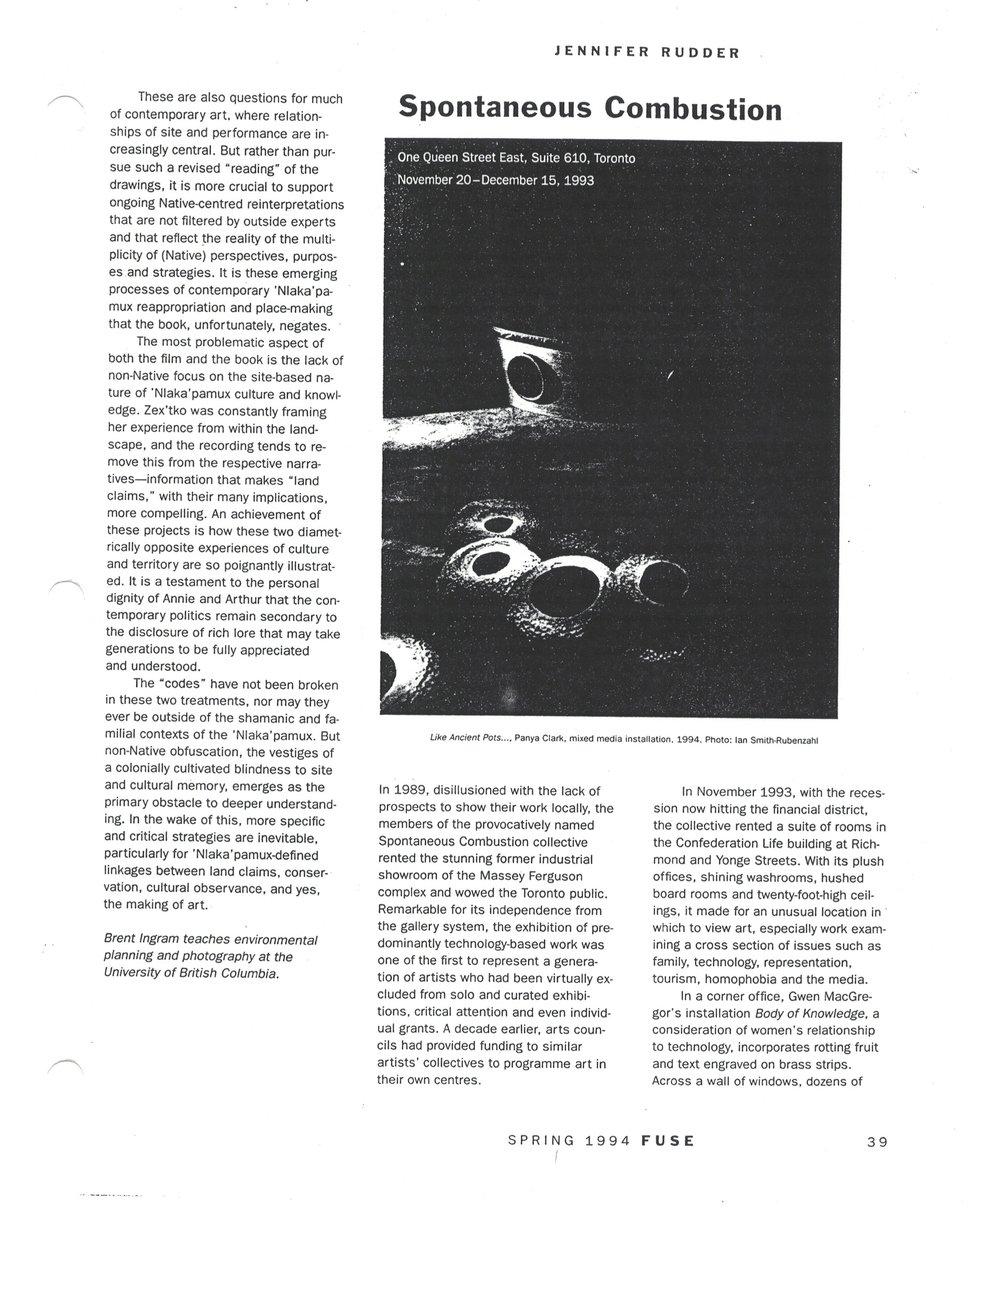 Fuse 1994 - Jennifer Rudder1.jpg